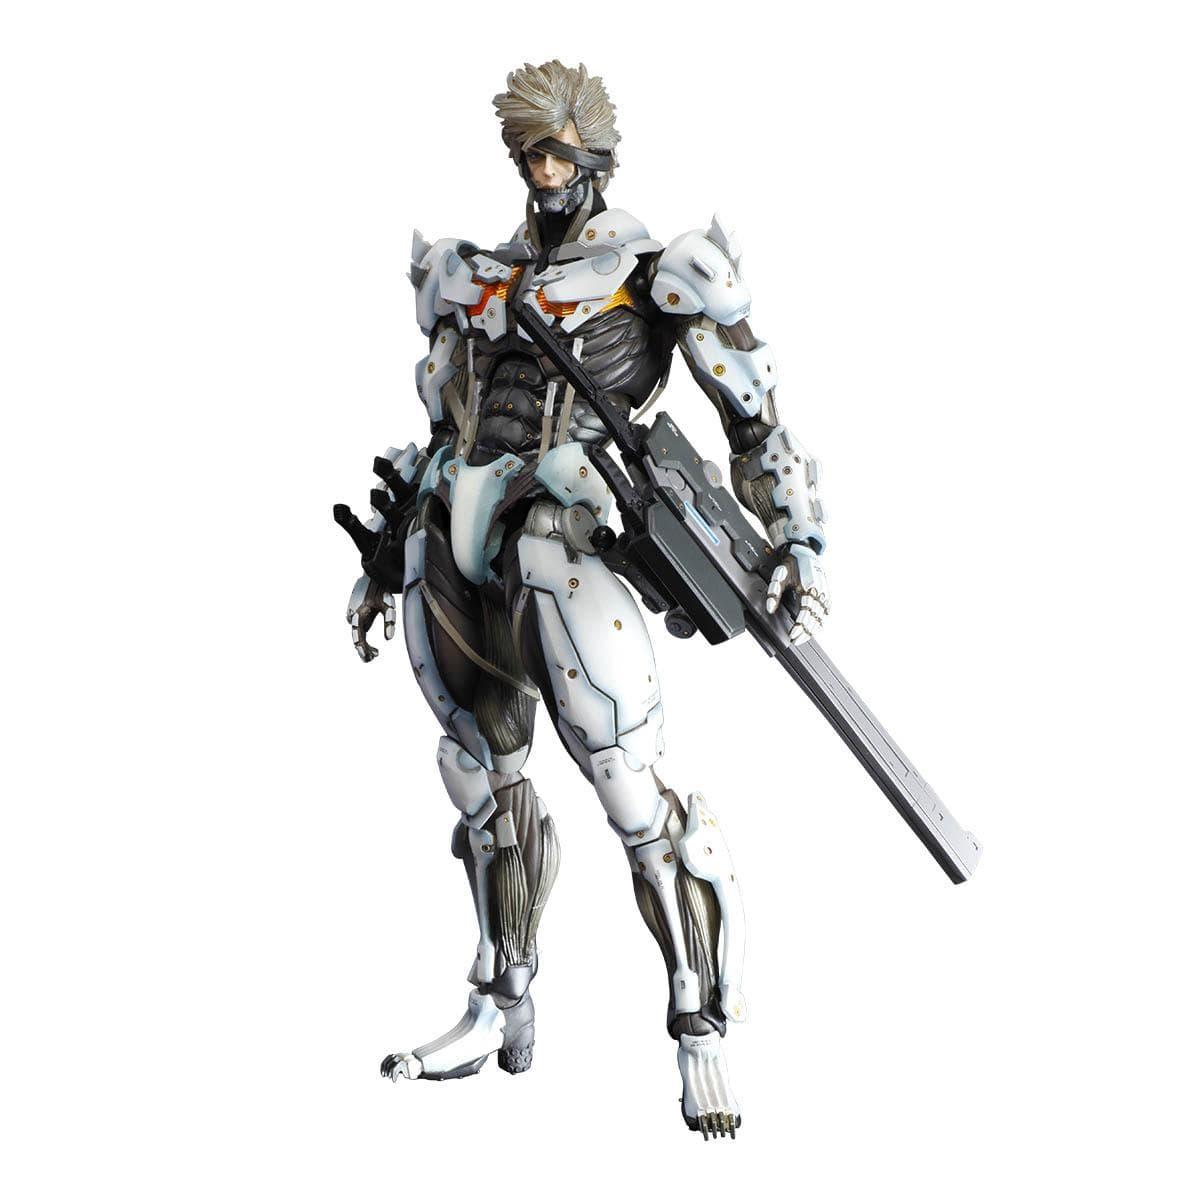 Metal Gear Rising: Revengeance Xbox